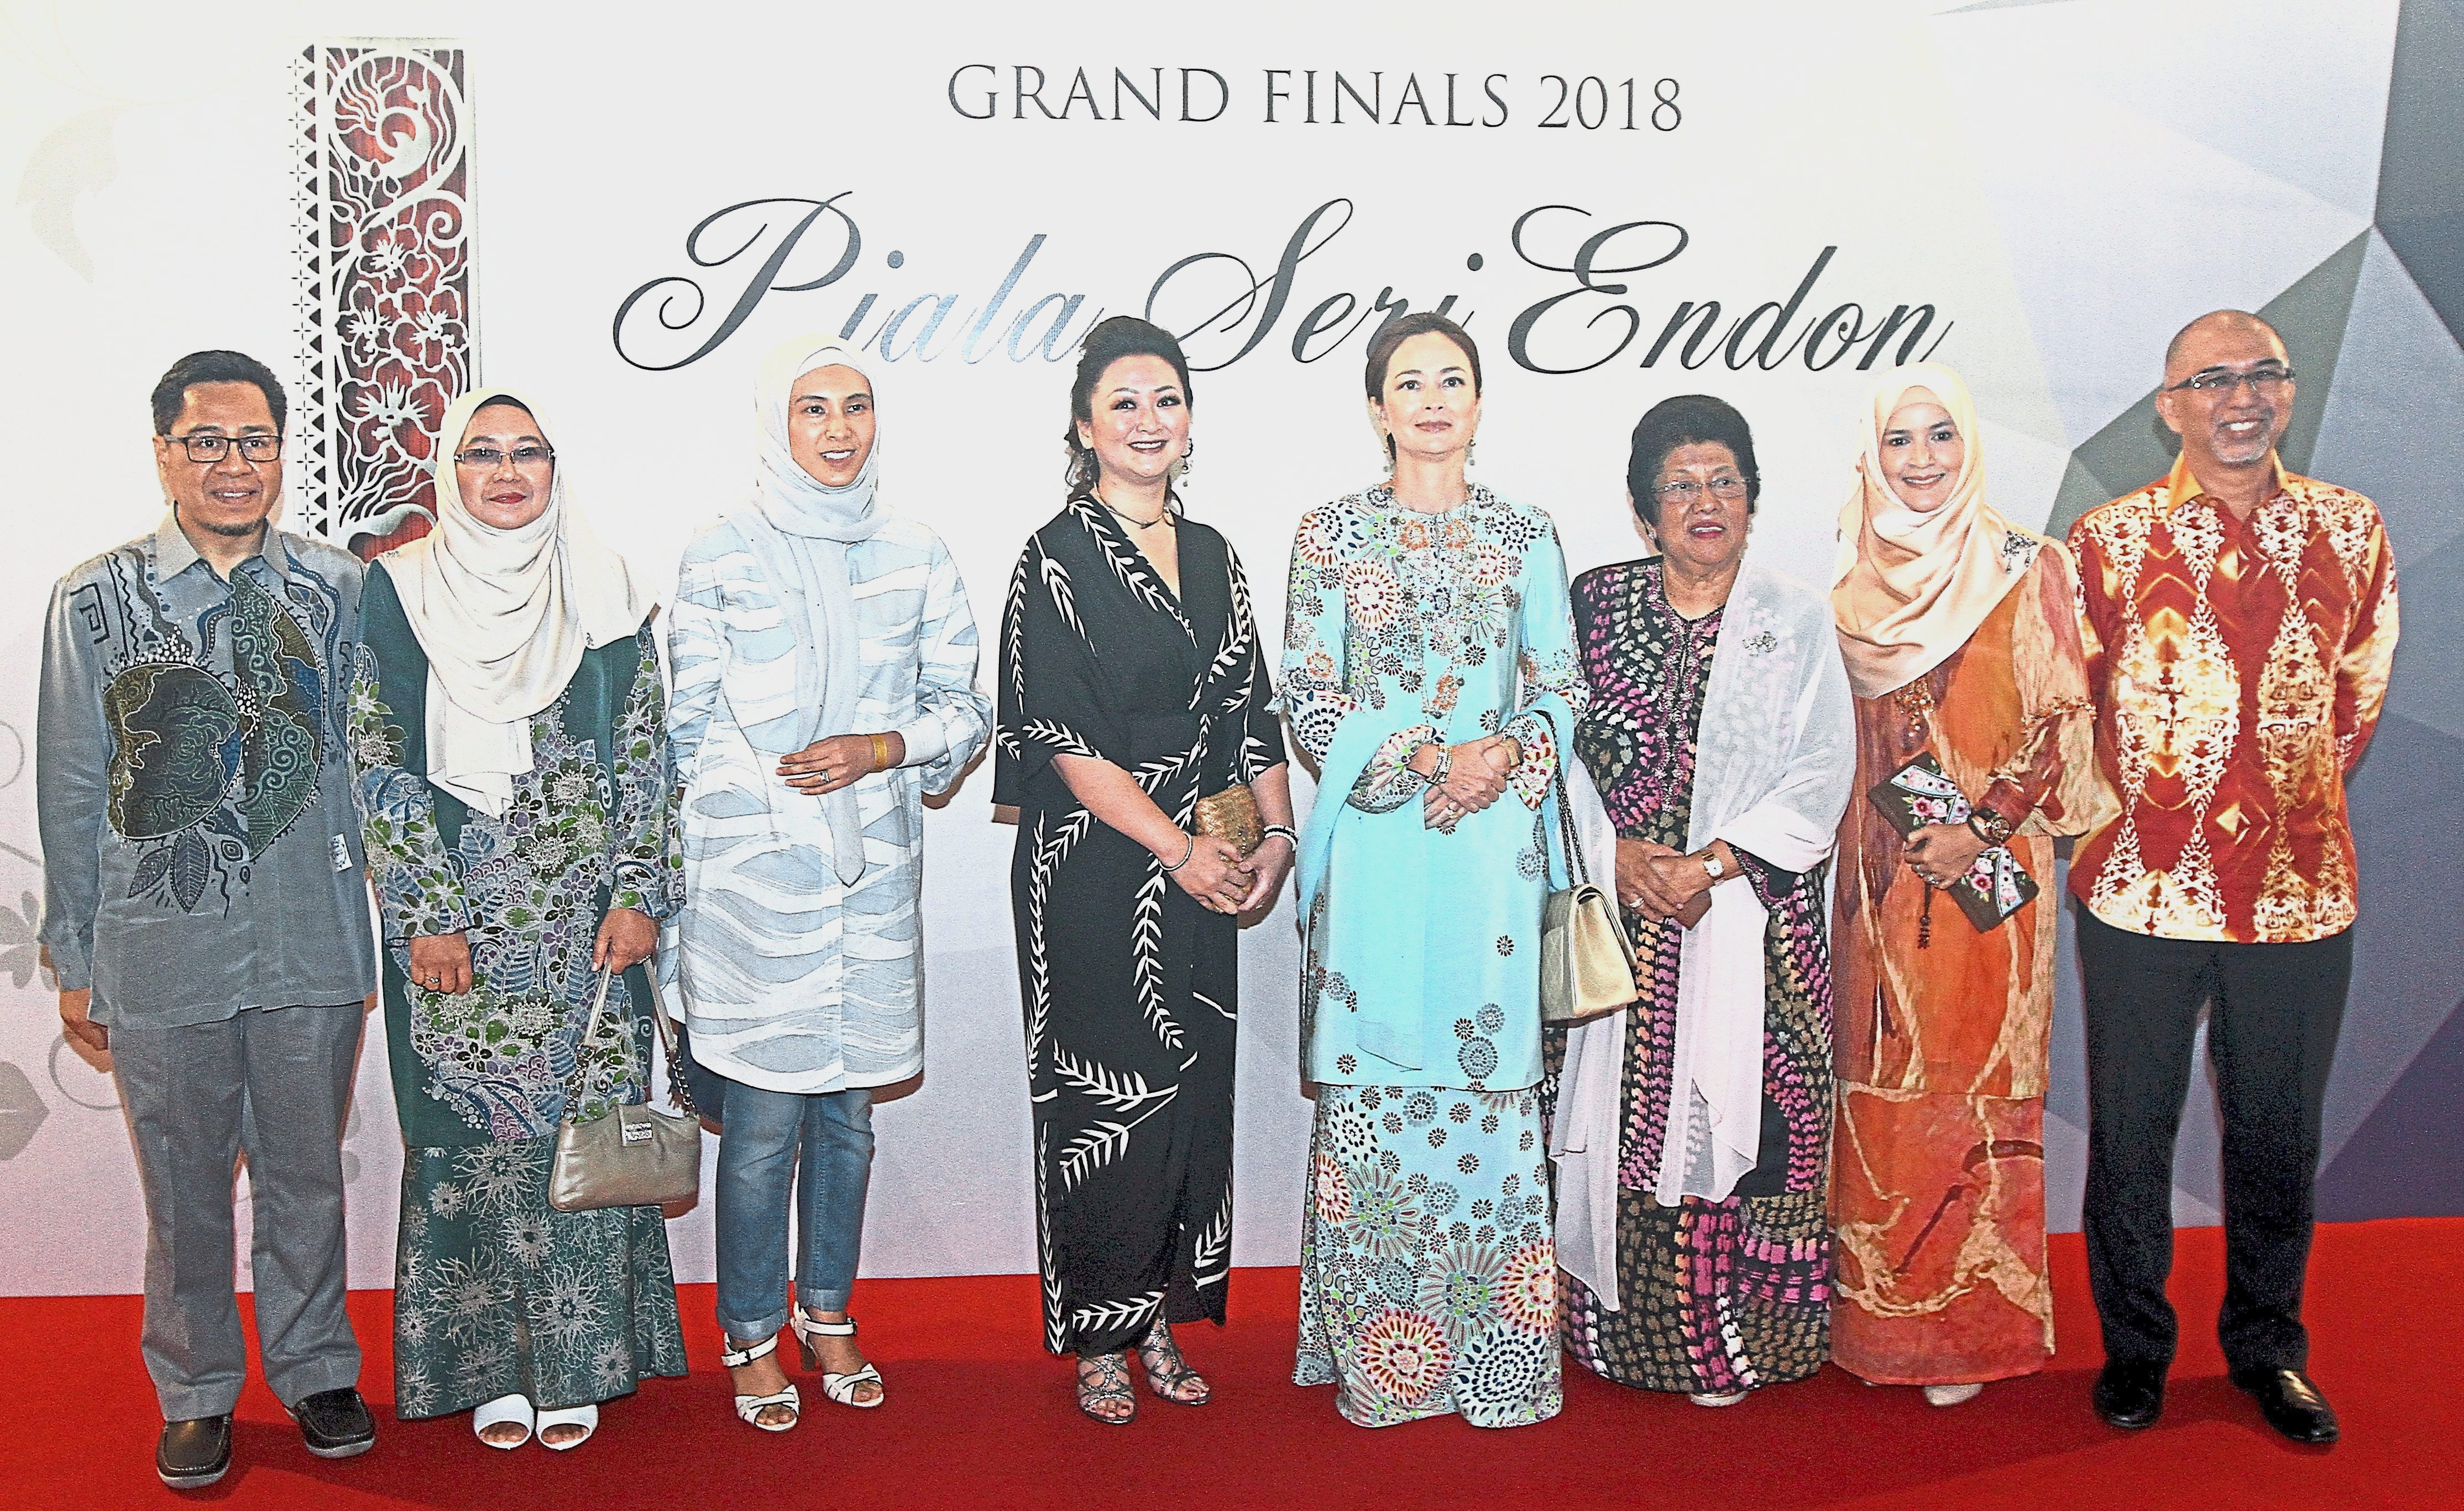 (From third left) Nurul Izzah, Nori, Tuanku Zara, and Leela at the grand finals of the Piala Seri Endon Batik Design Competition 2018.